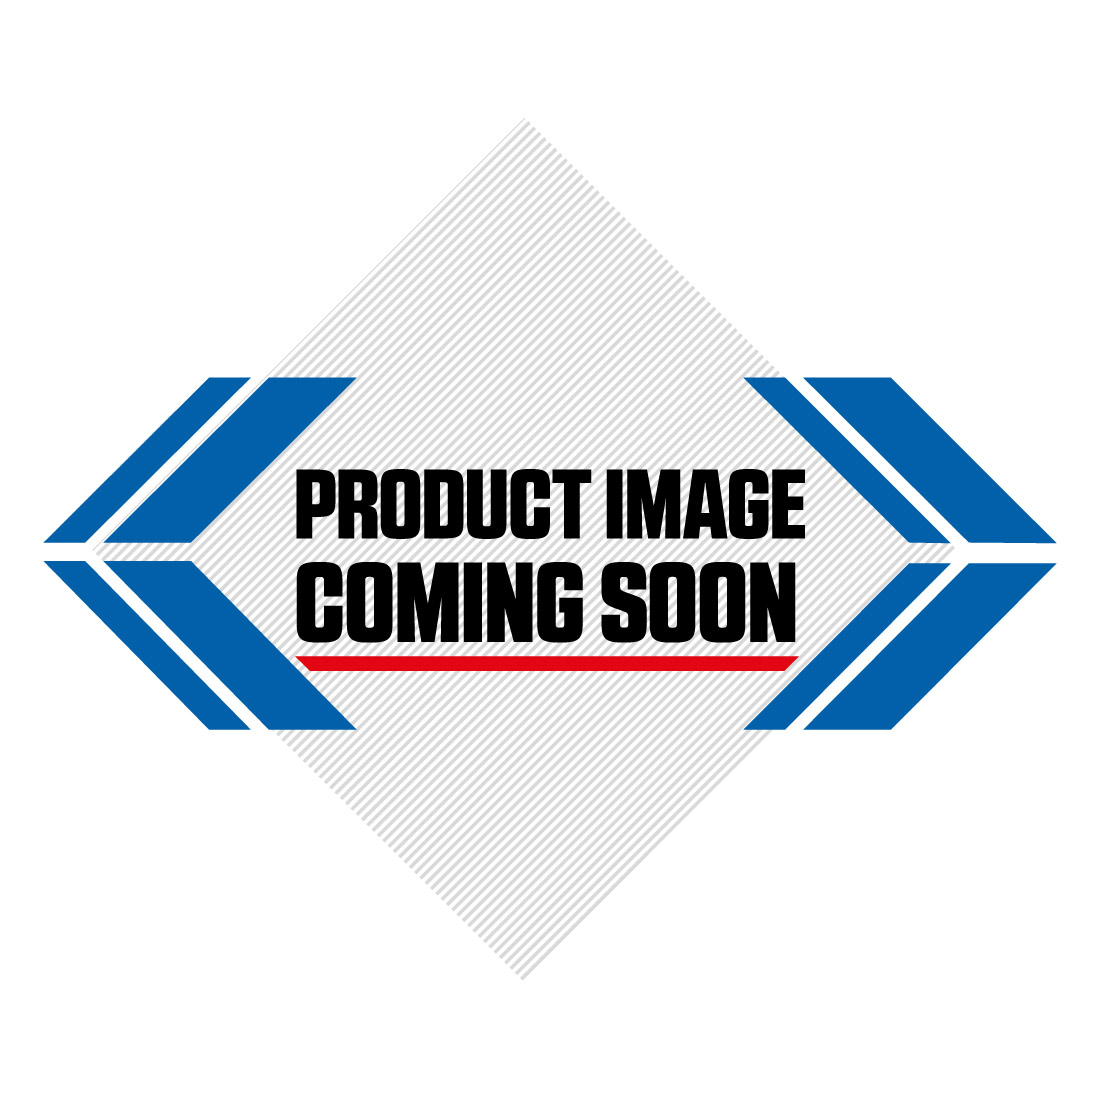 Suzuki Plastic Kit Suzuki RMZ 450 (08-17) White Image-4>